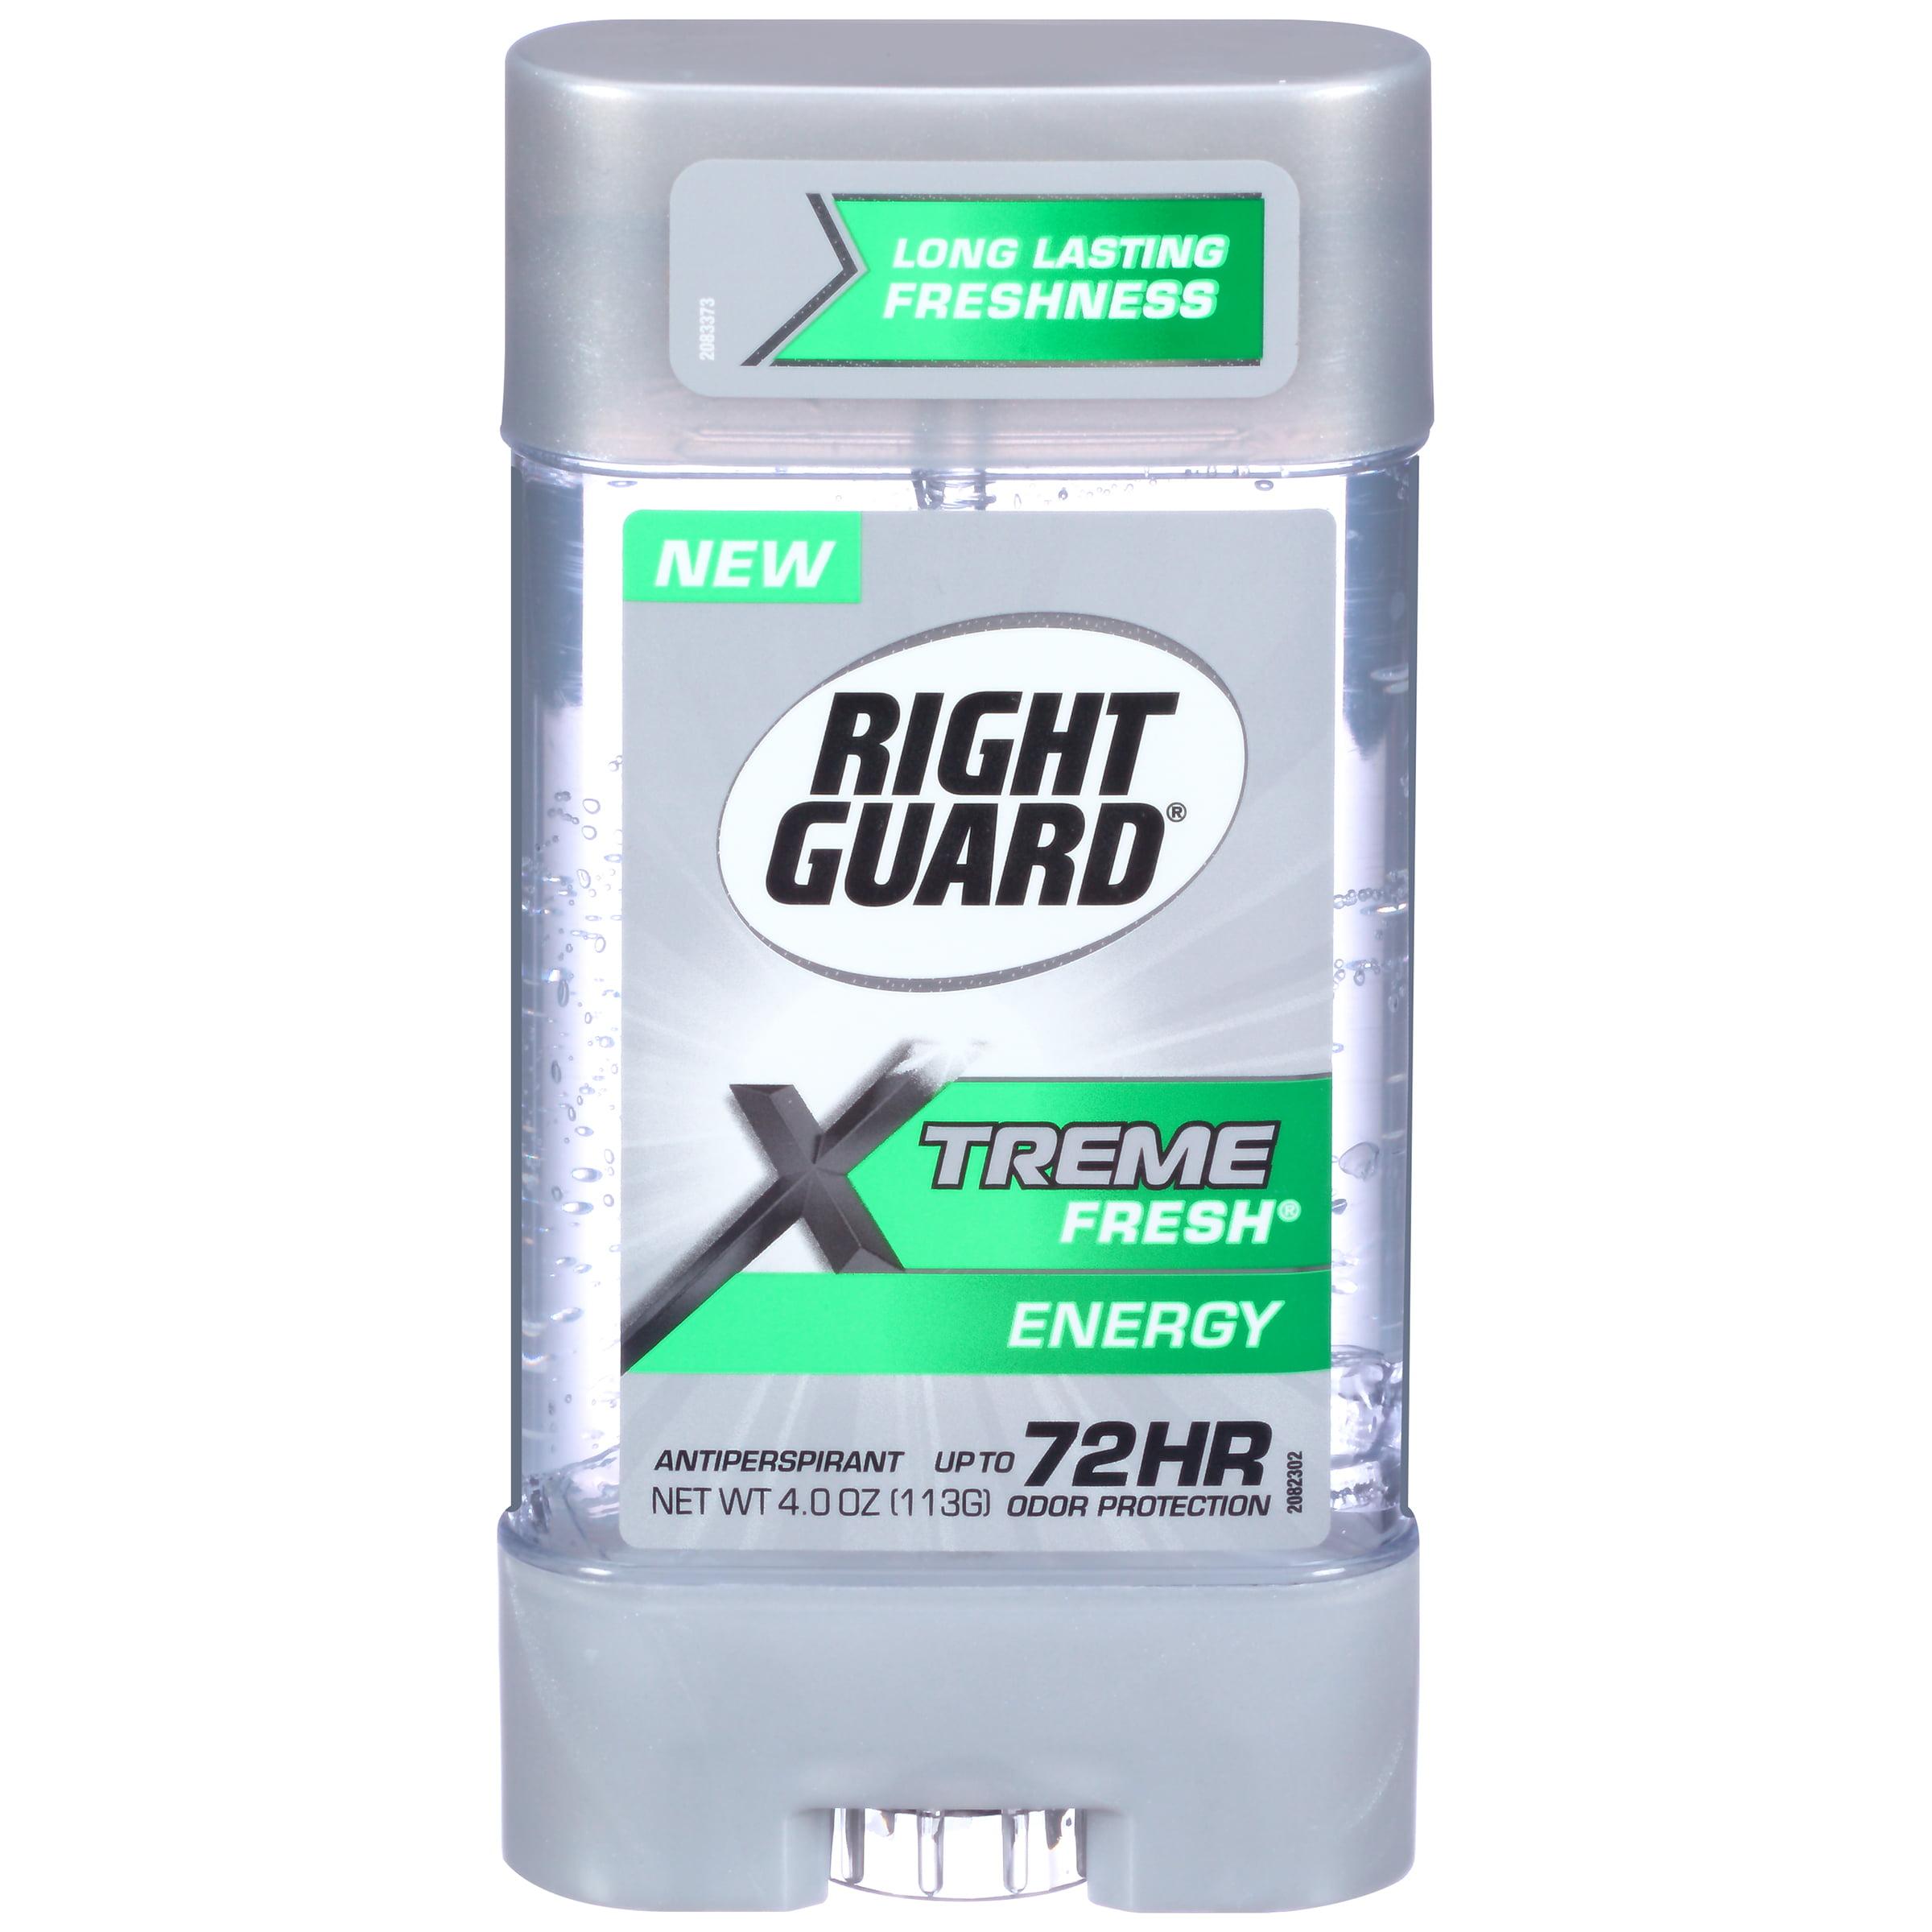 Right Guard Xtreme Fresh Antiperspirant Deodorant Gel, Energy, 4 Ounce